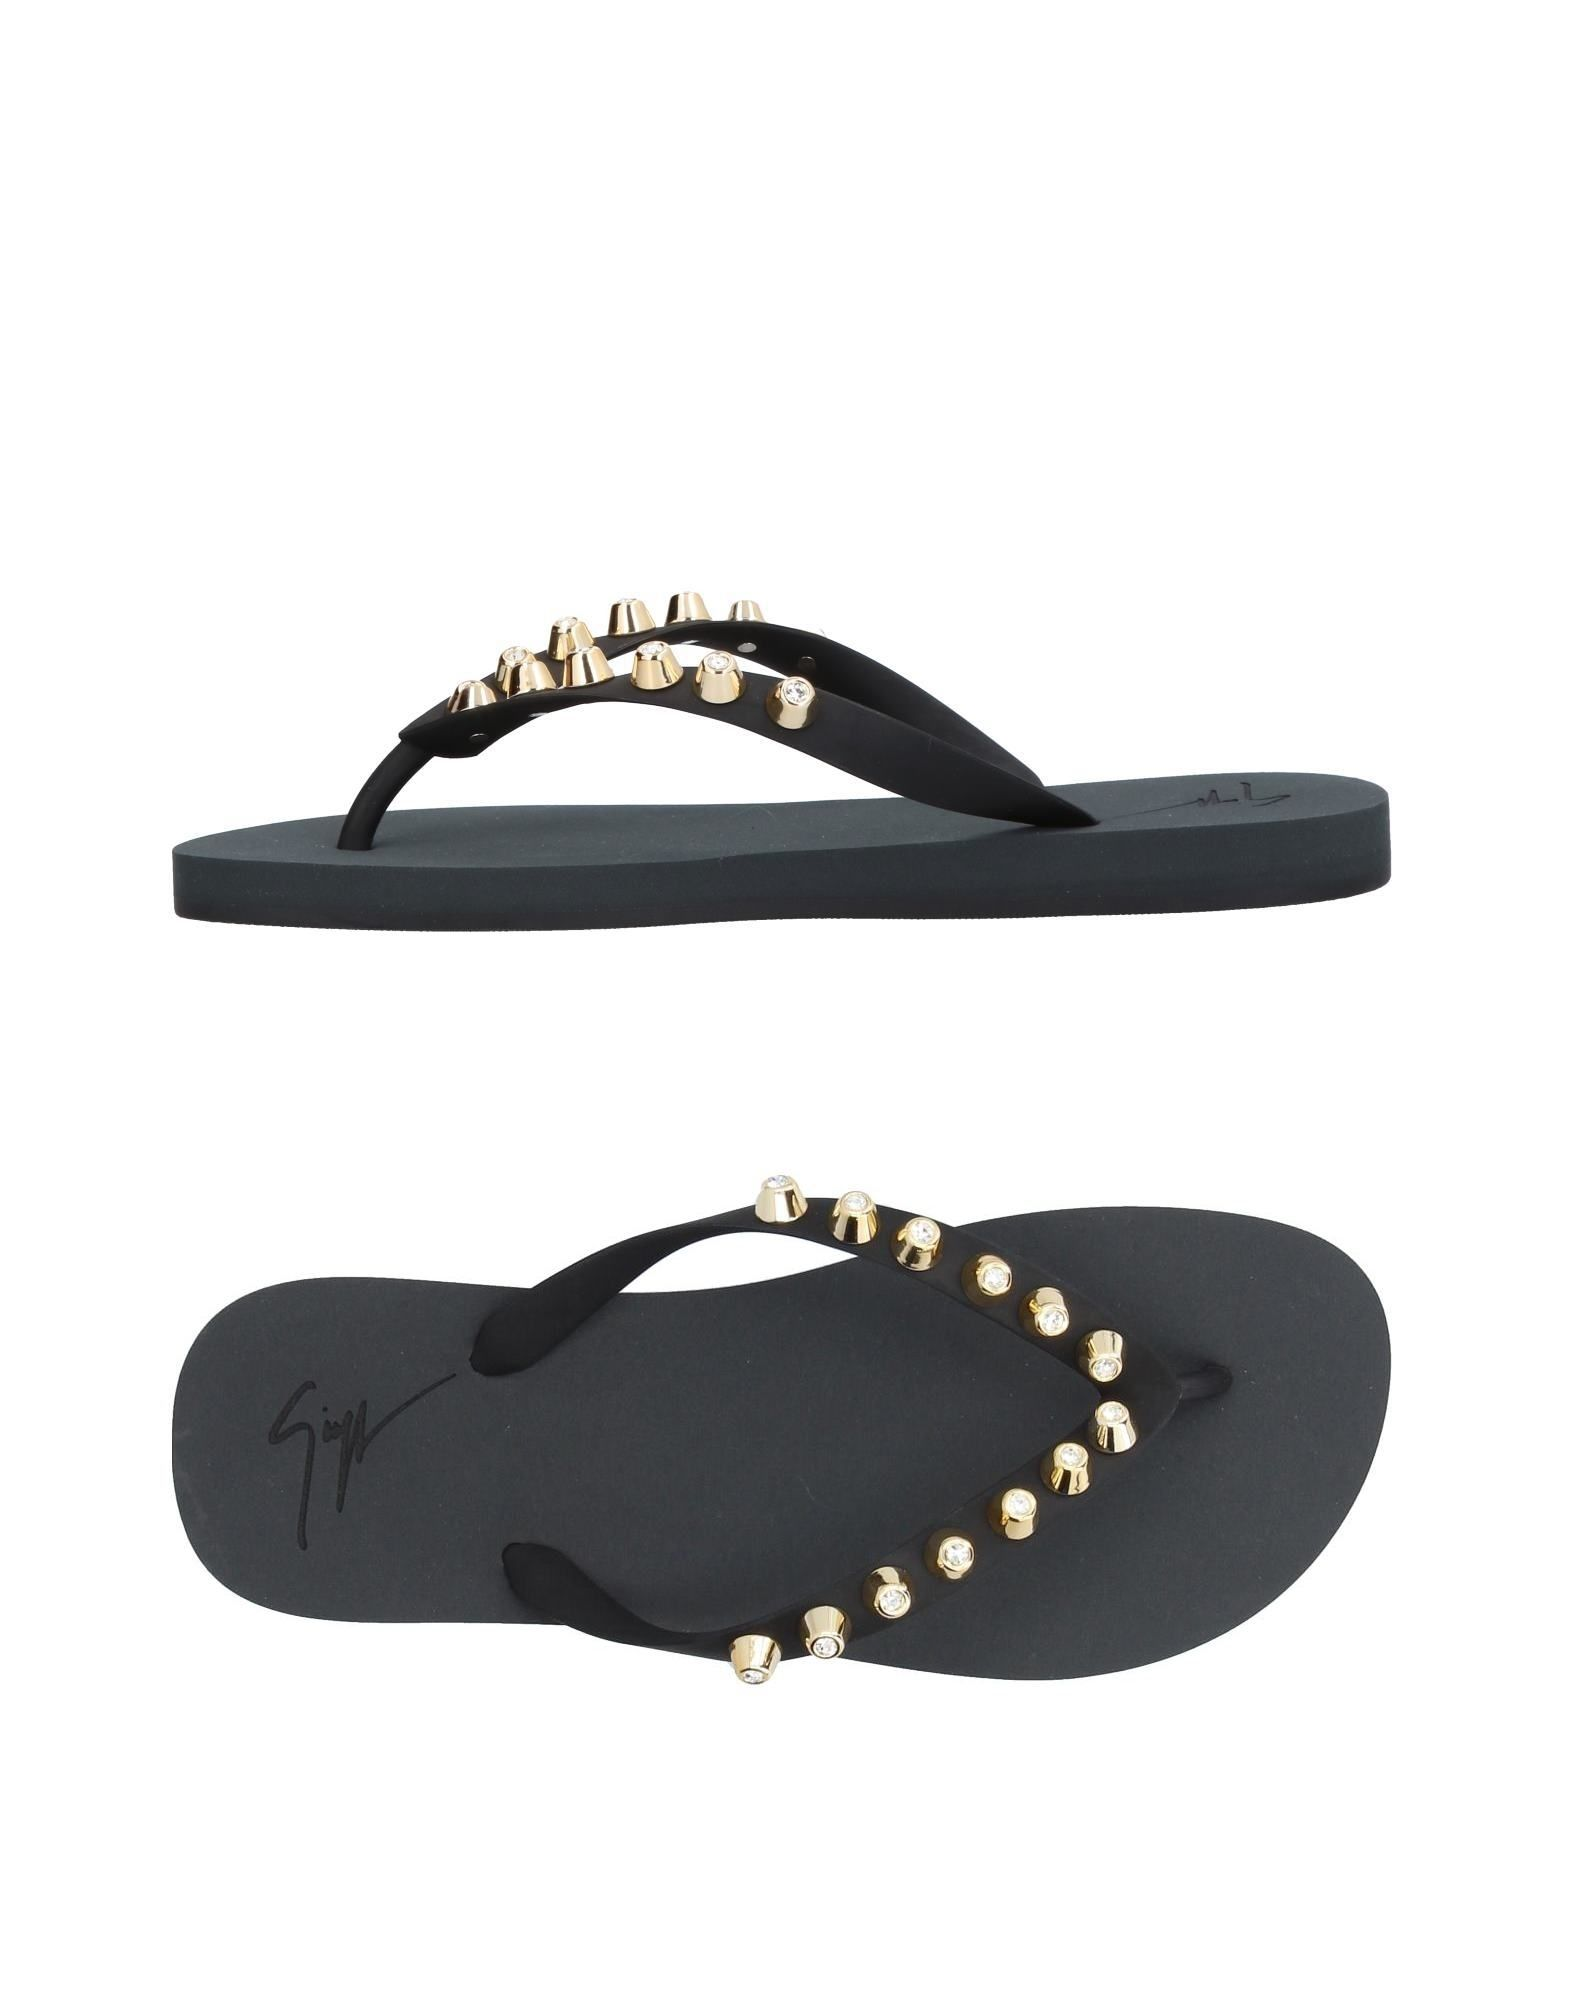 Giuseppe Zanotti Dianetten Herren  11380520UU Gute Qualität beliebte Schuhe